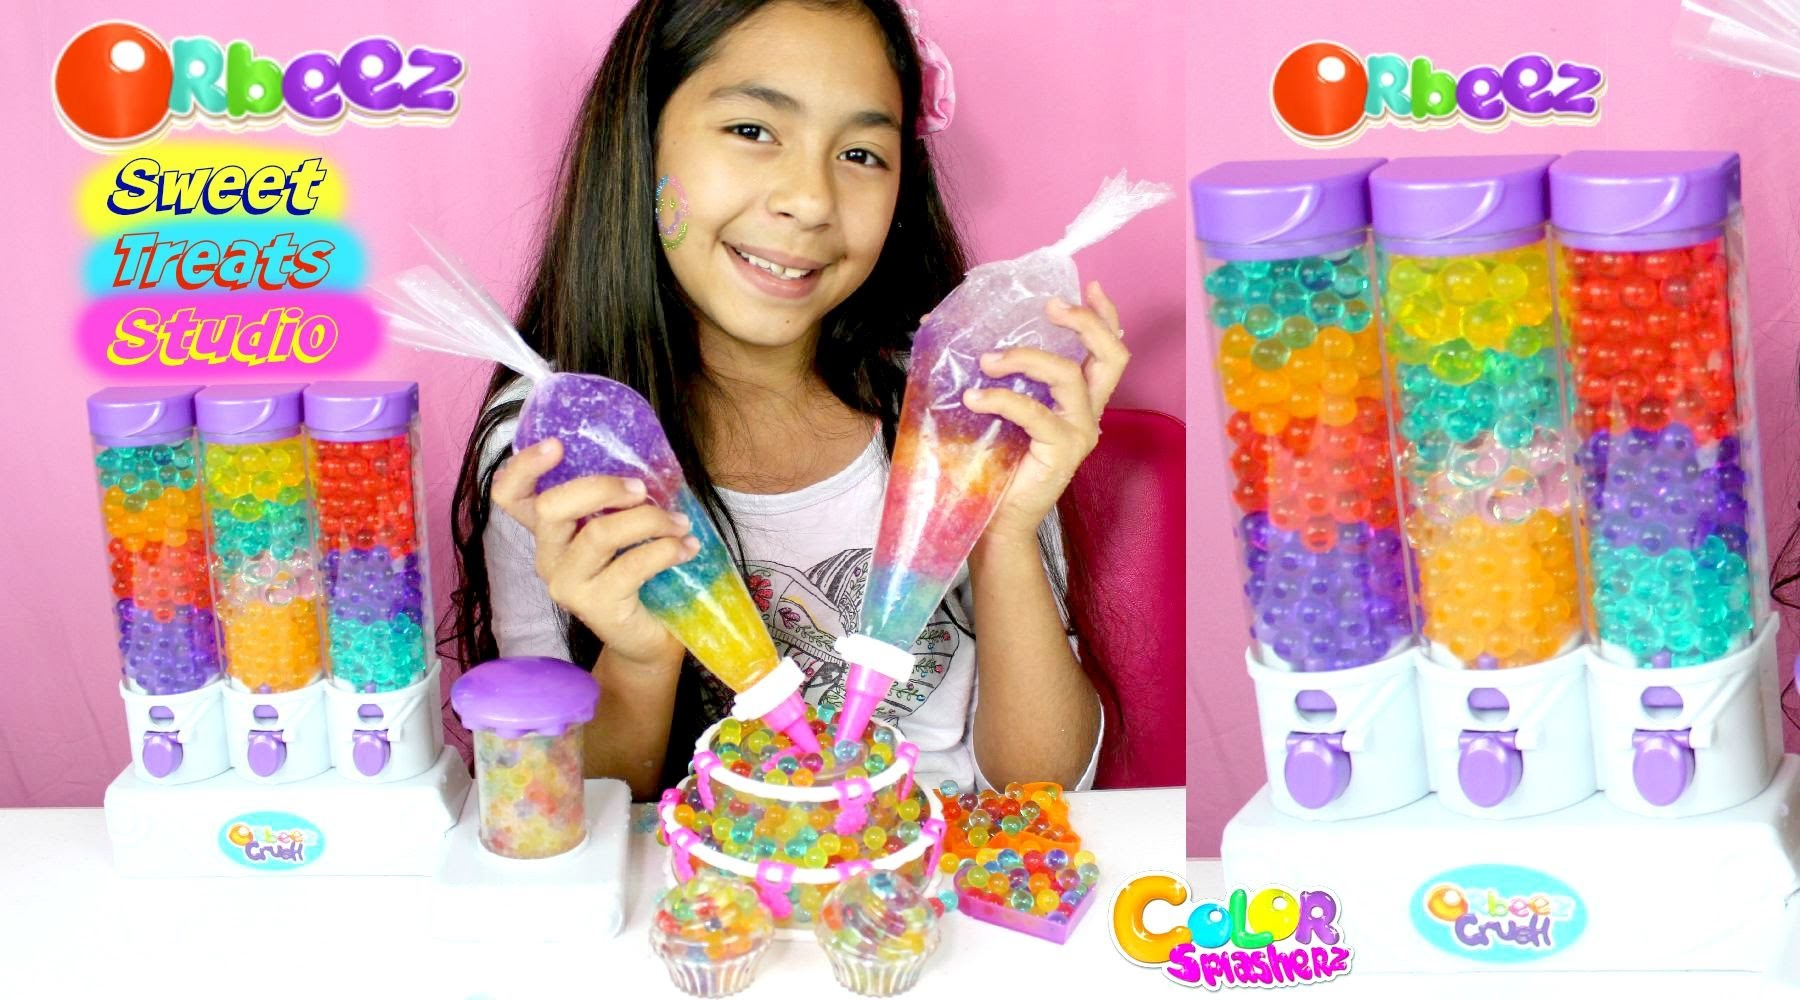 New Orbeez Crush Sweet Treats Studio Orbeez Toys | B2cutecupcakes